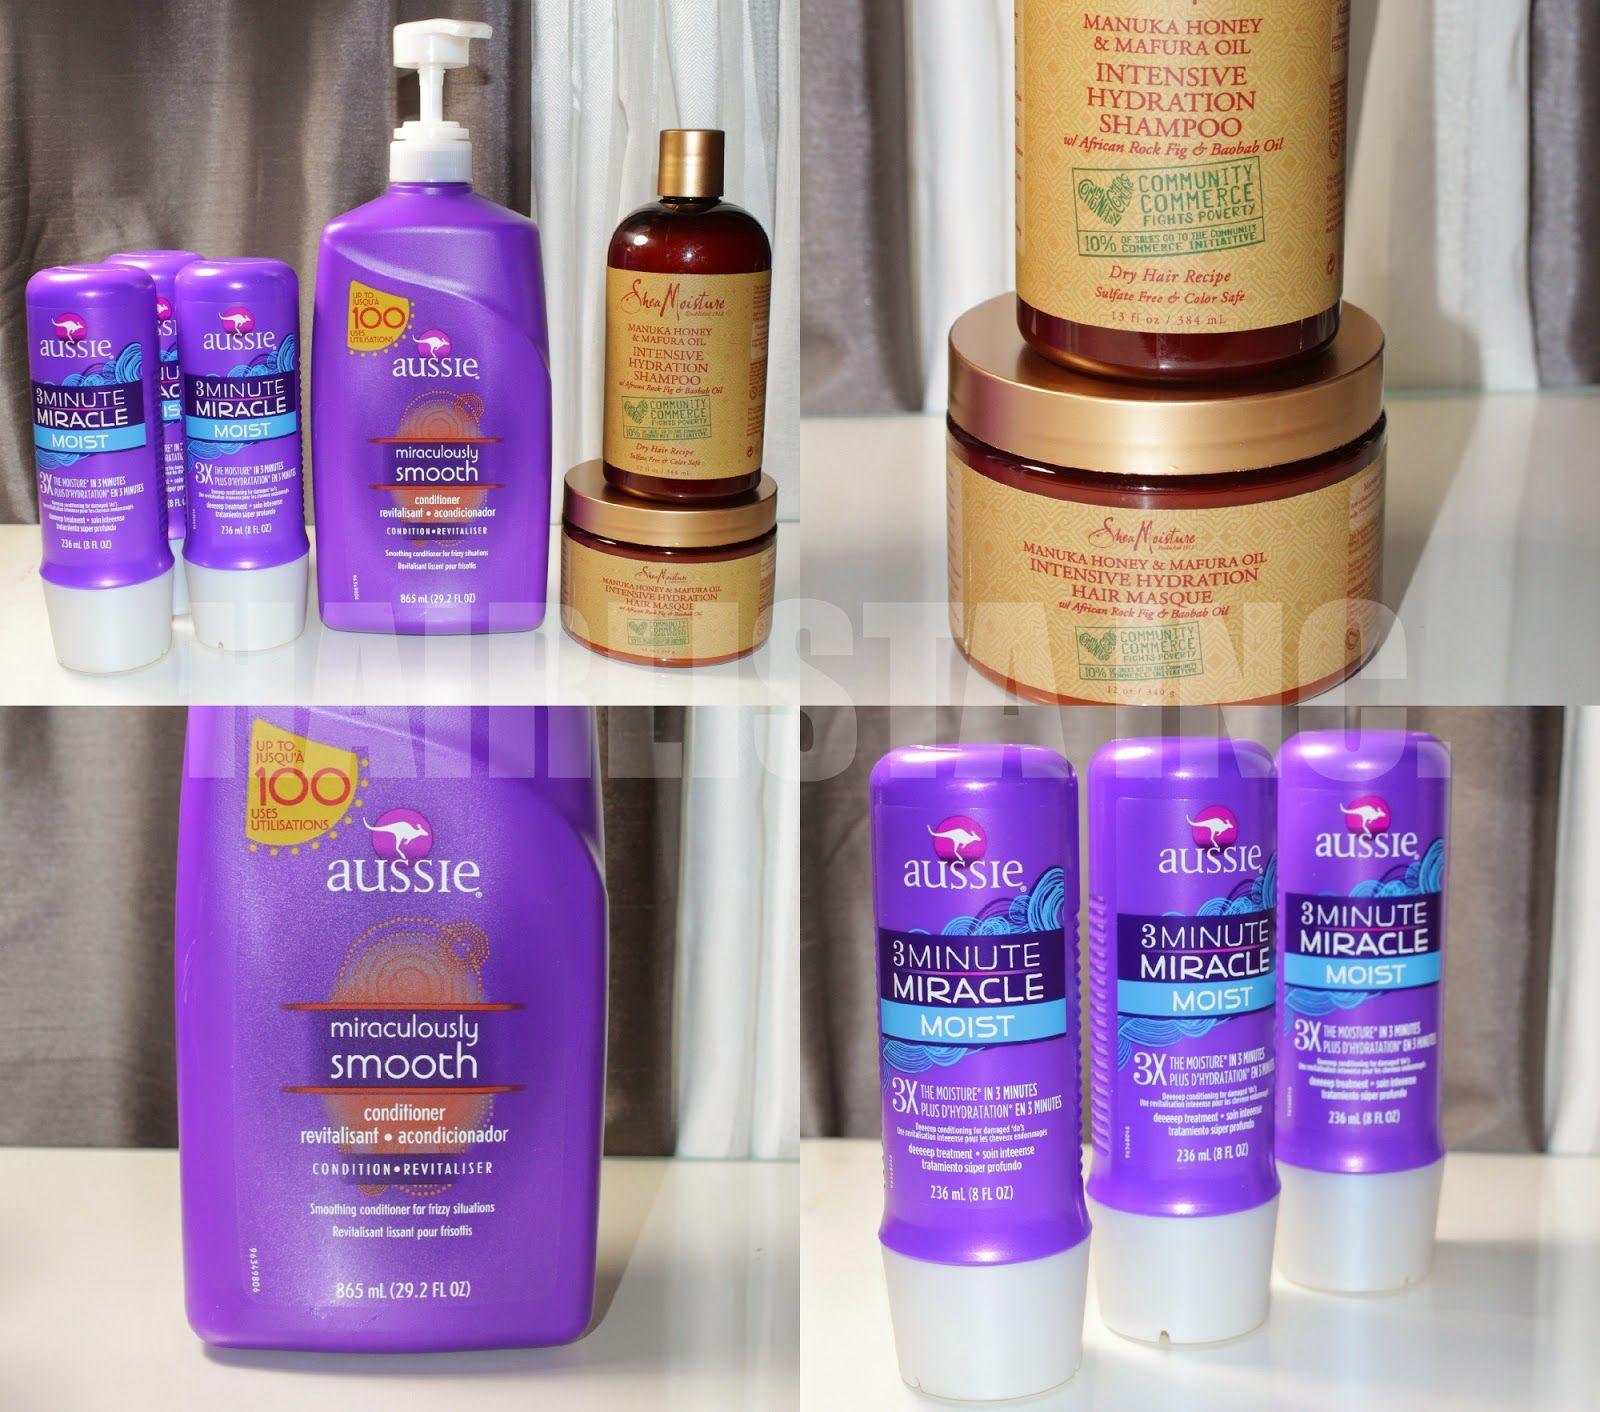 Product Haul: Aussie Moist   Aussie 3 Minute   Shea Moisture Manuka Honey (Hairliciousinc.com) #hairlista #healthyhaircare #hairjourney